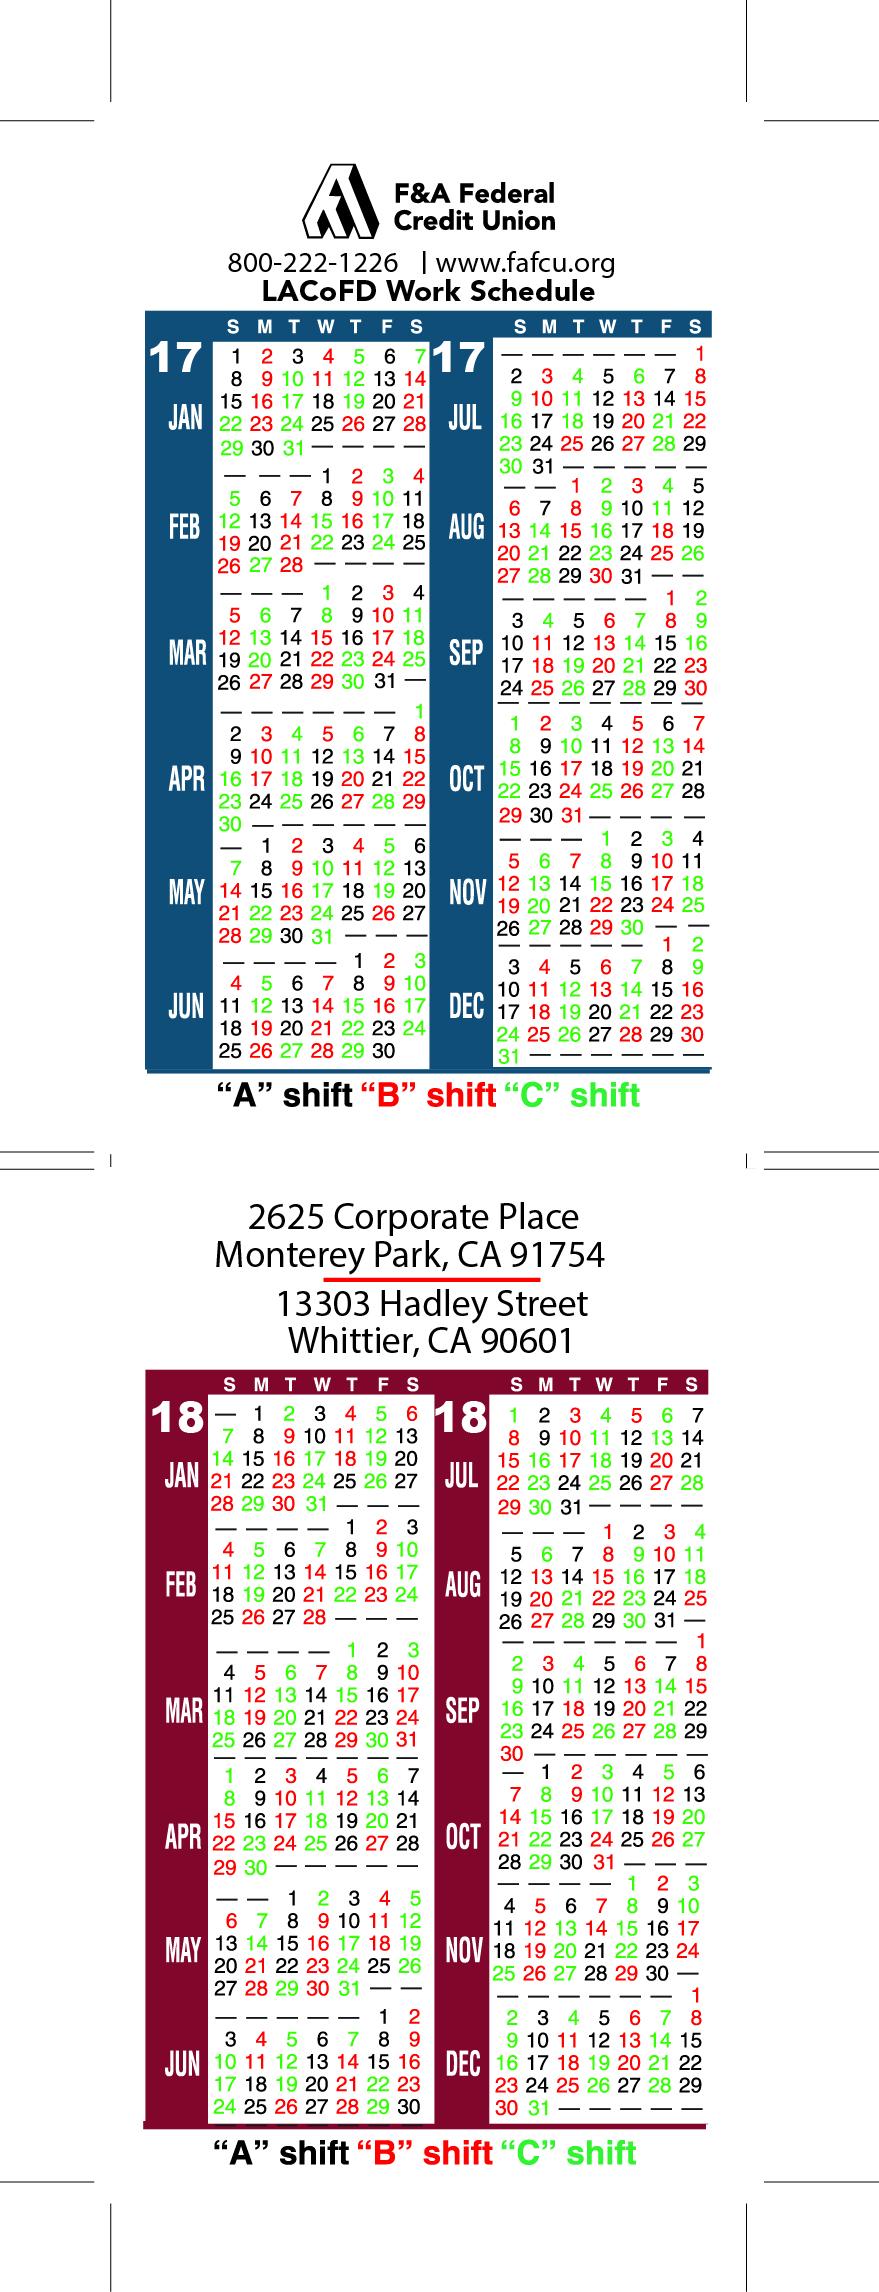 Hfd Shift Calendar 2021 | Calendar Printables Free Blank intended for Printable Yearly Shift Rota Calendars 2021 Free